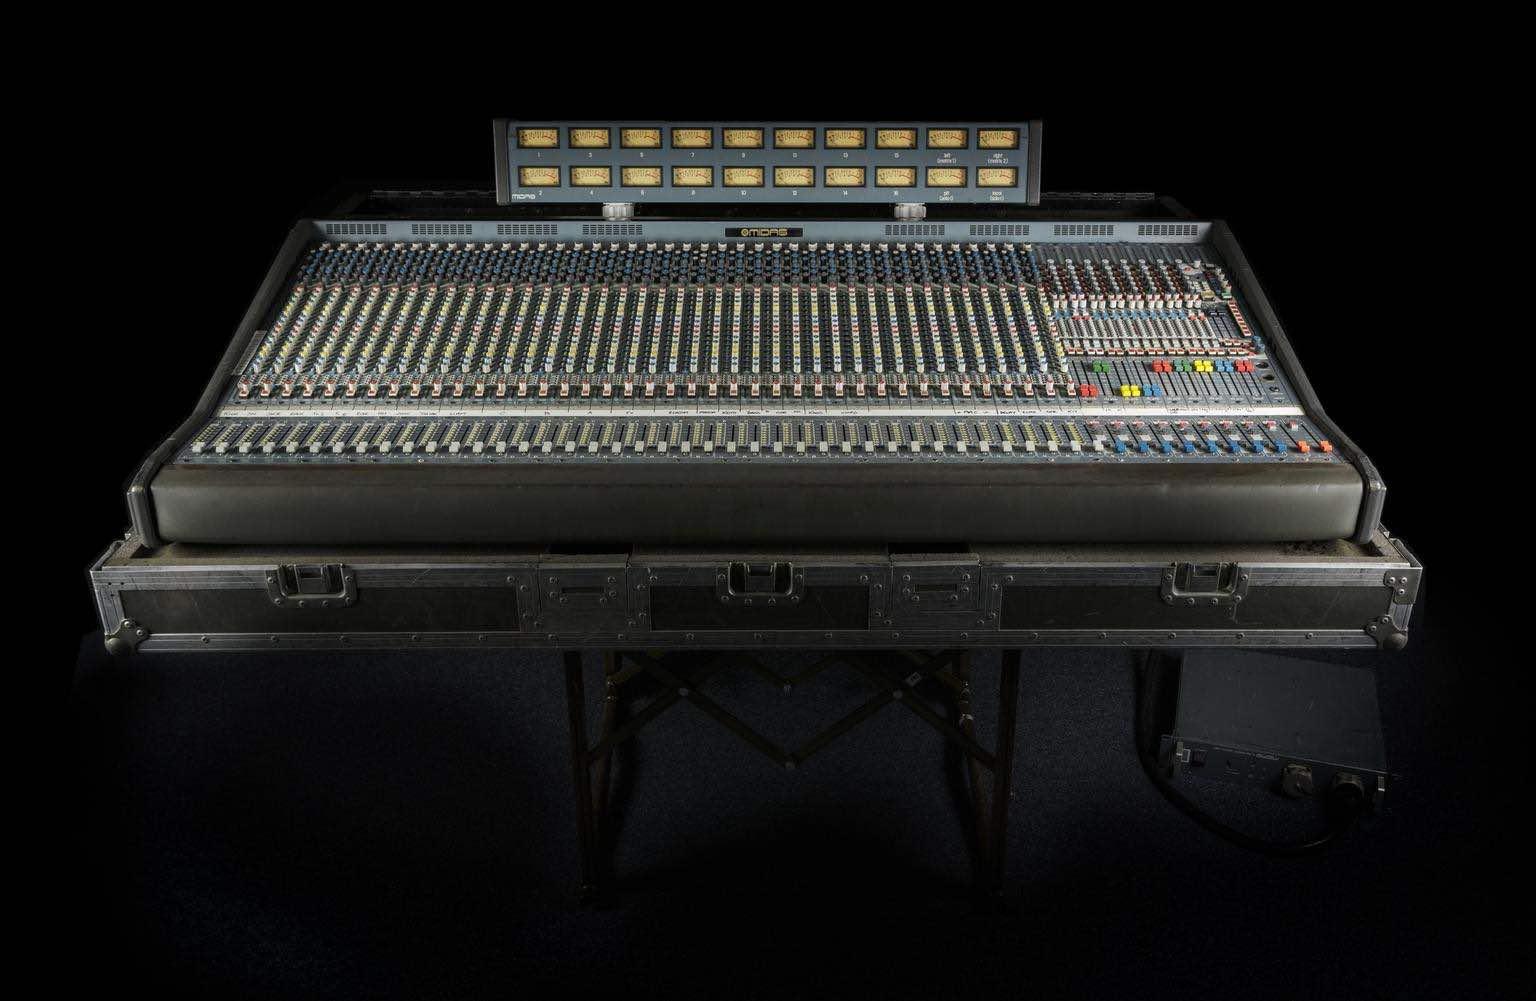 Andrea Benassai studio intervista hardware outboard analog audiofader